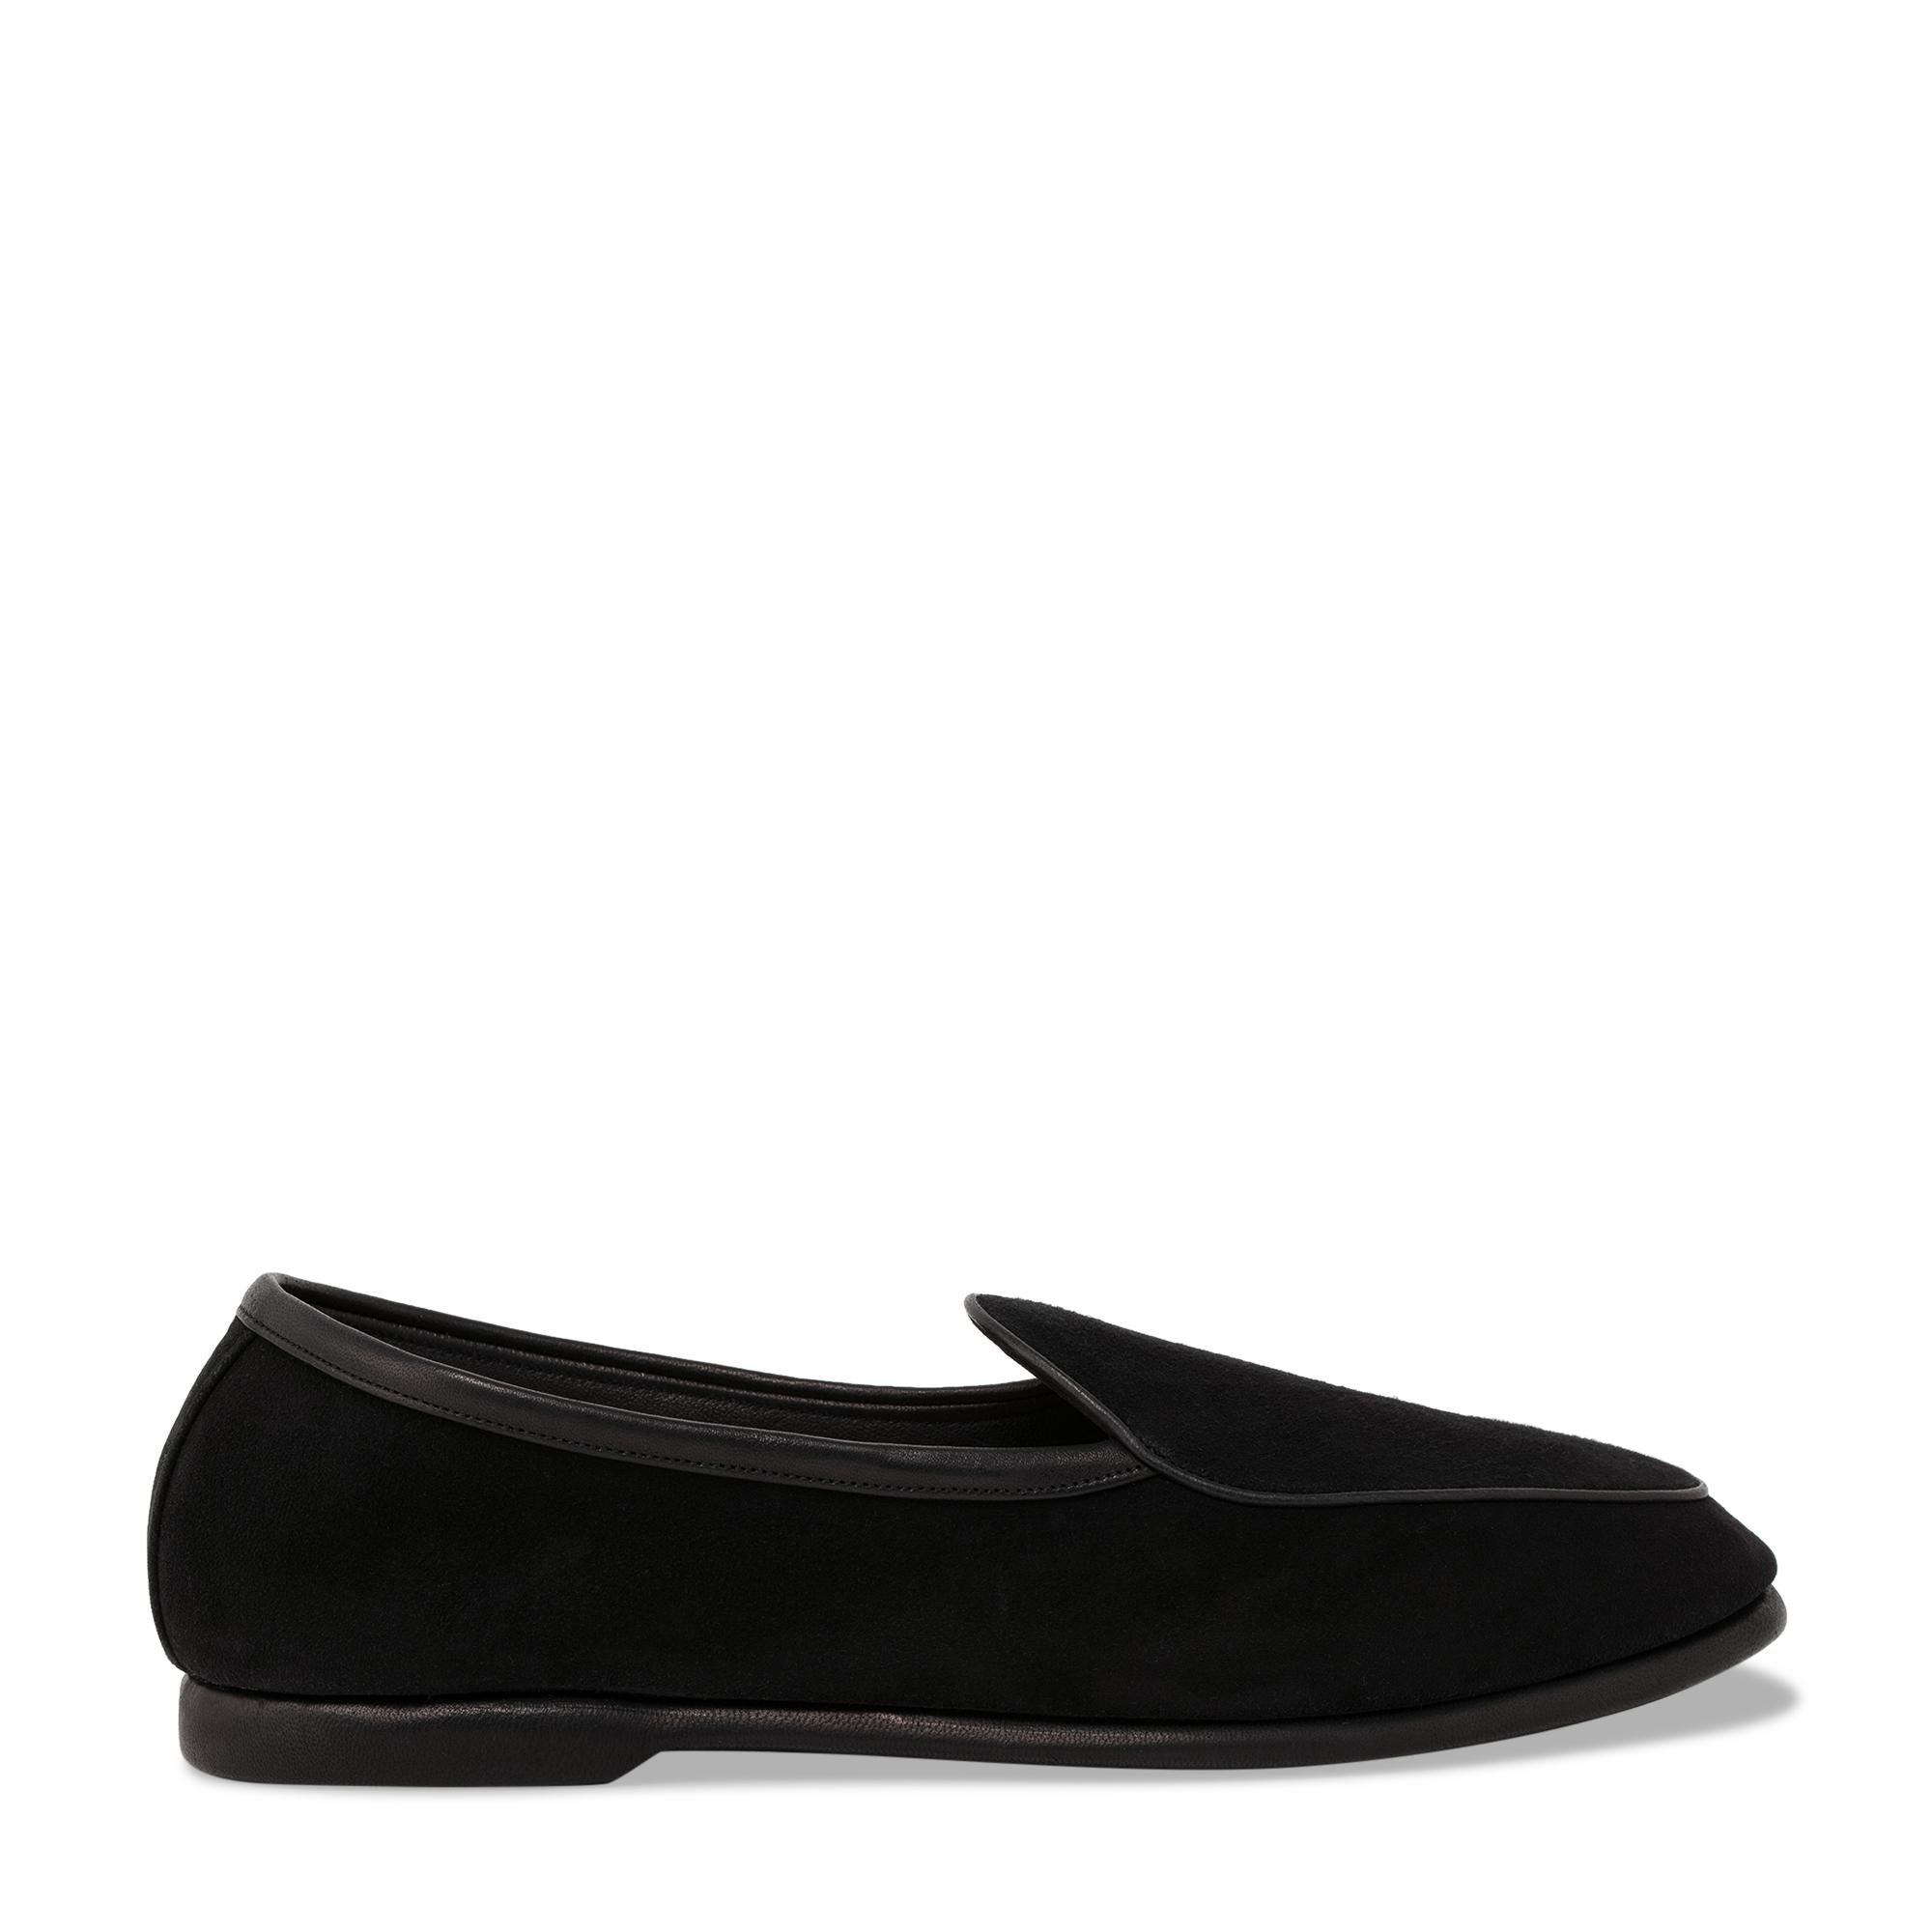 Sagan Lune loafers